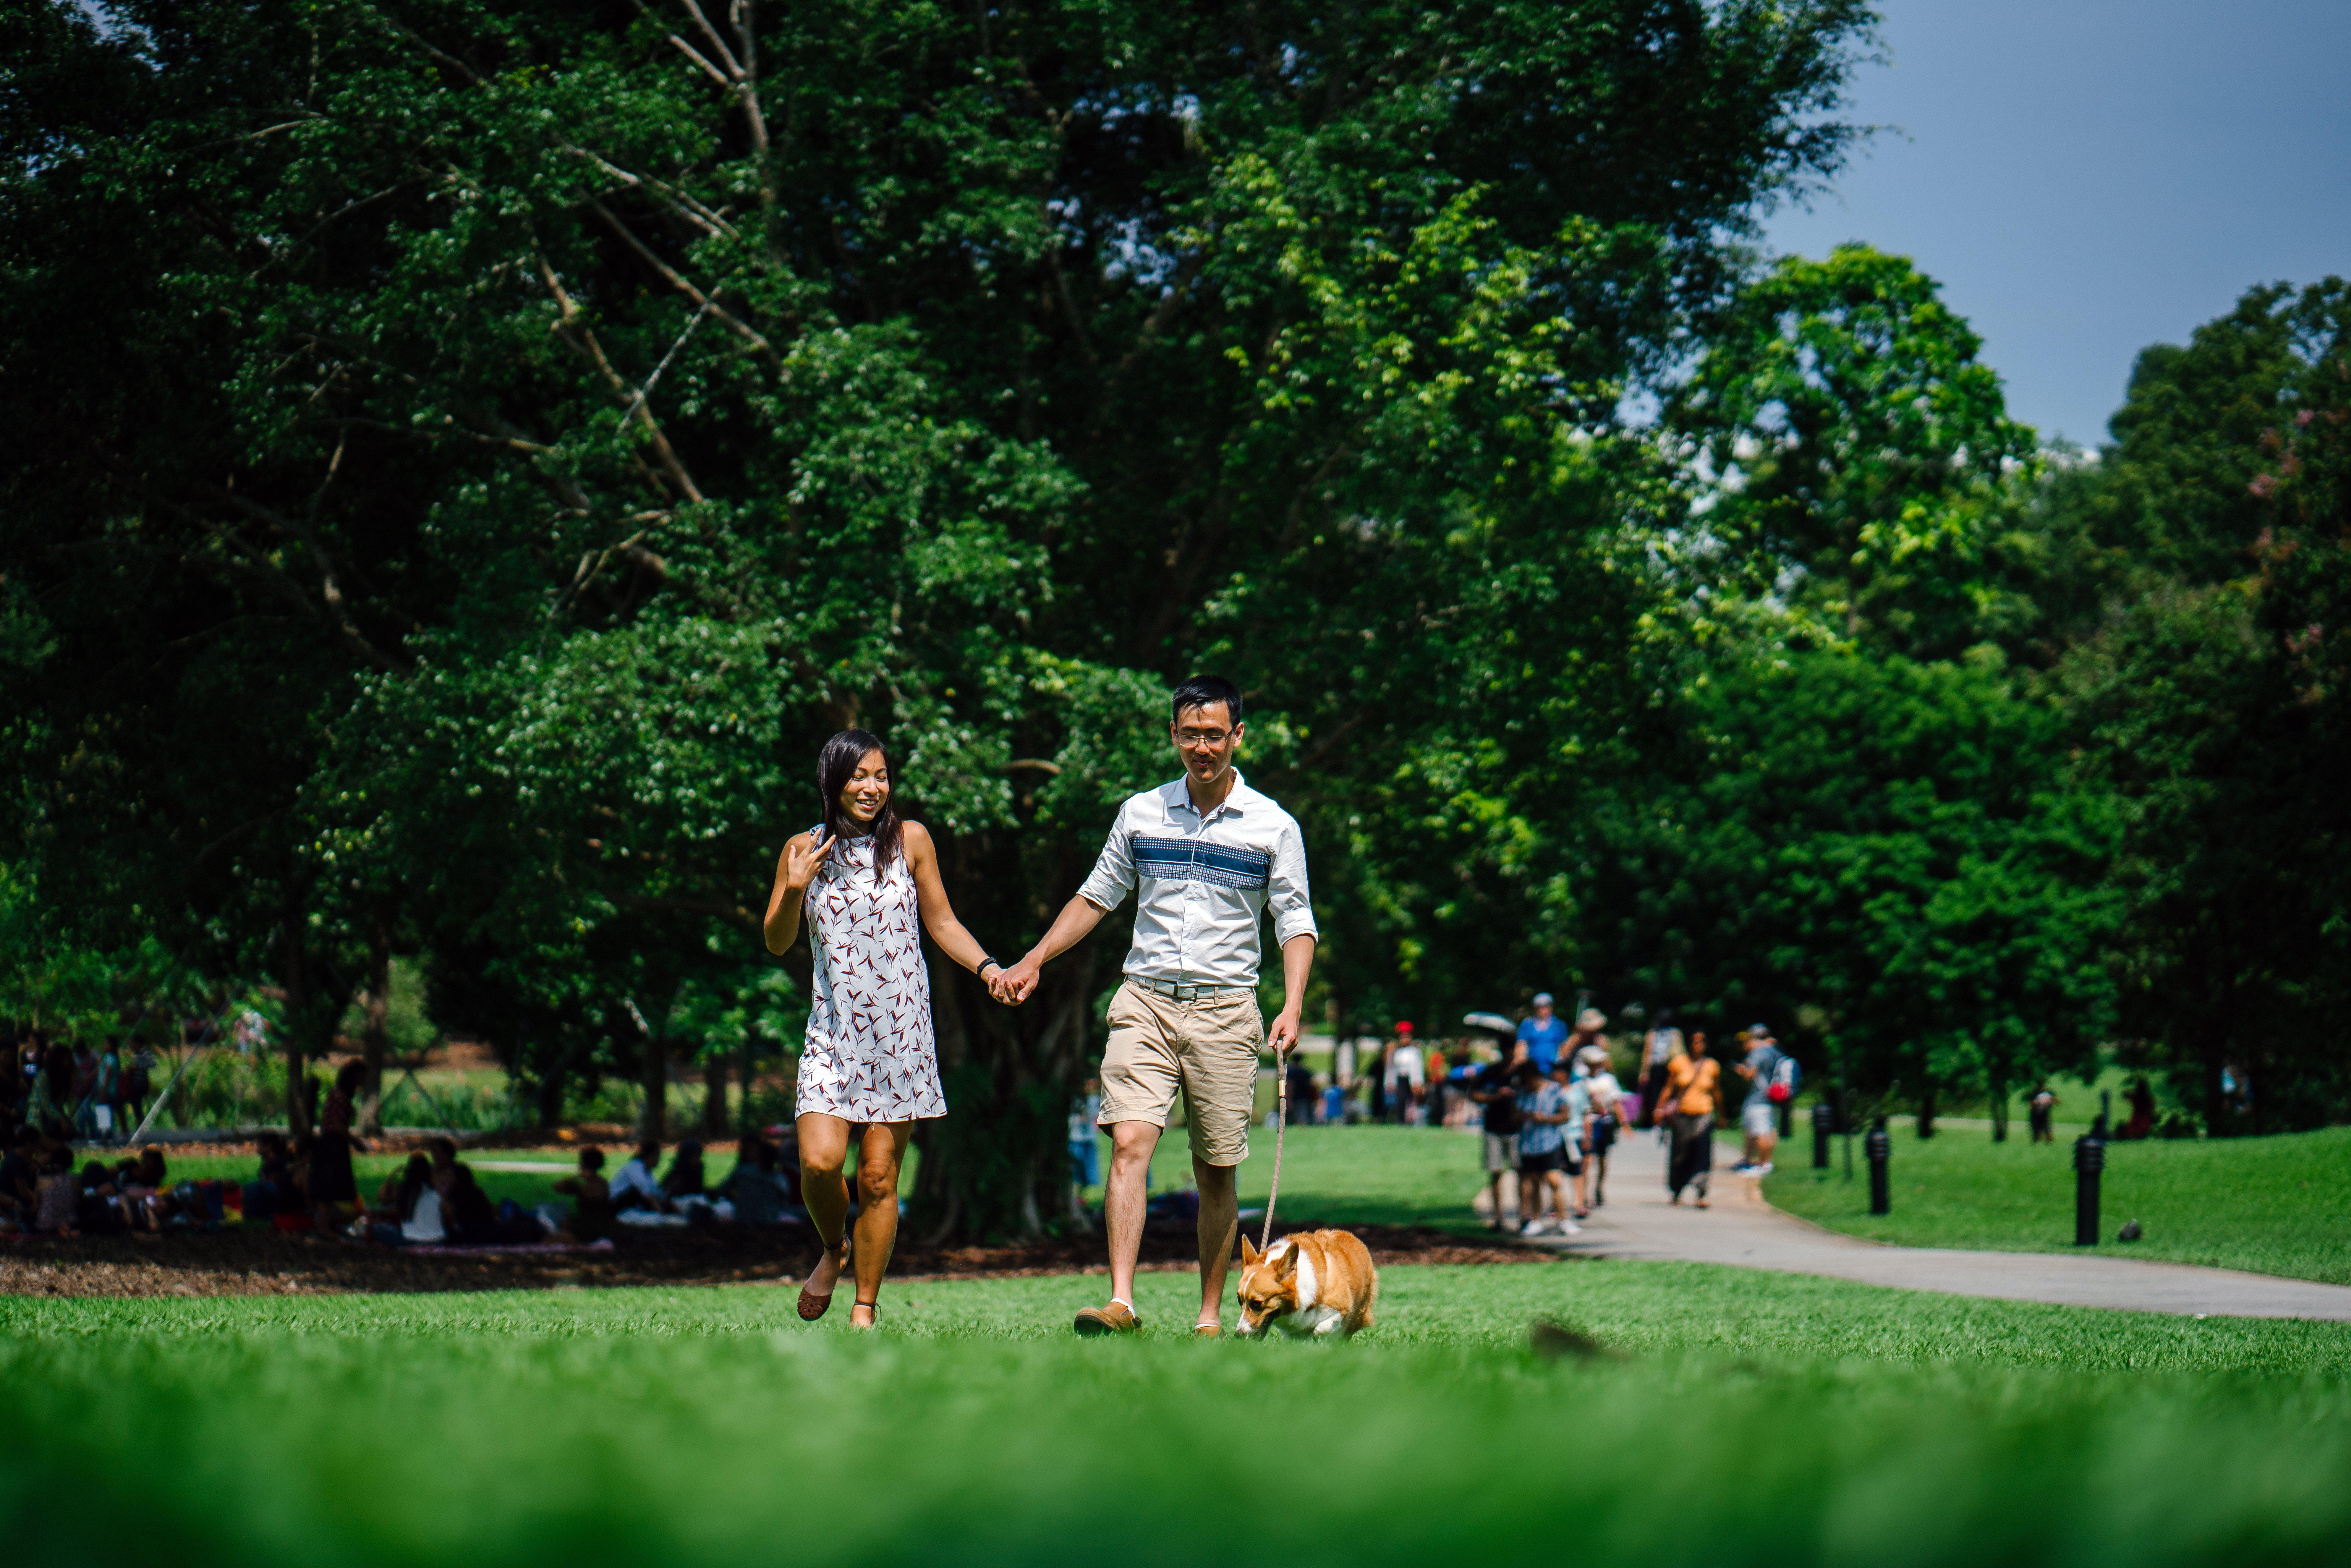 asien: menschen, bäume, gehen